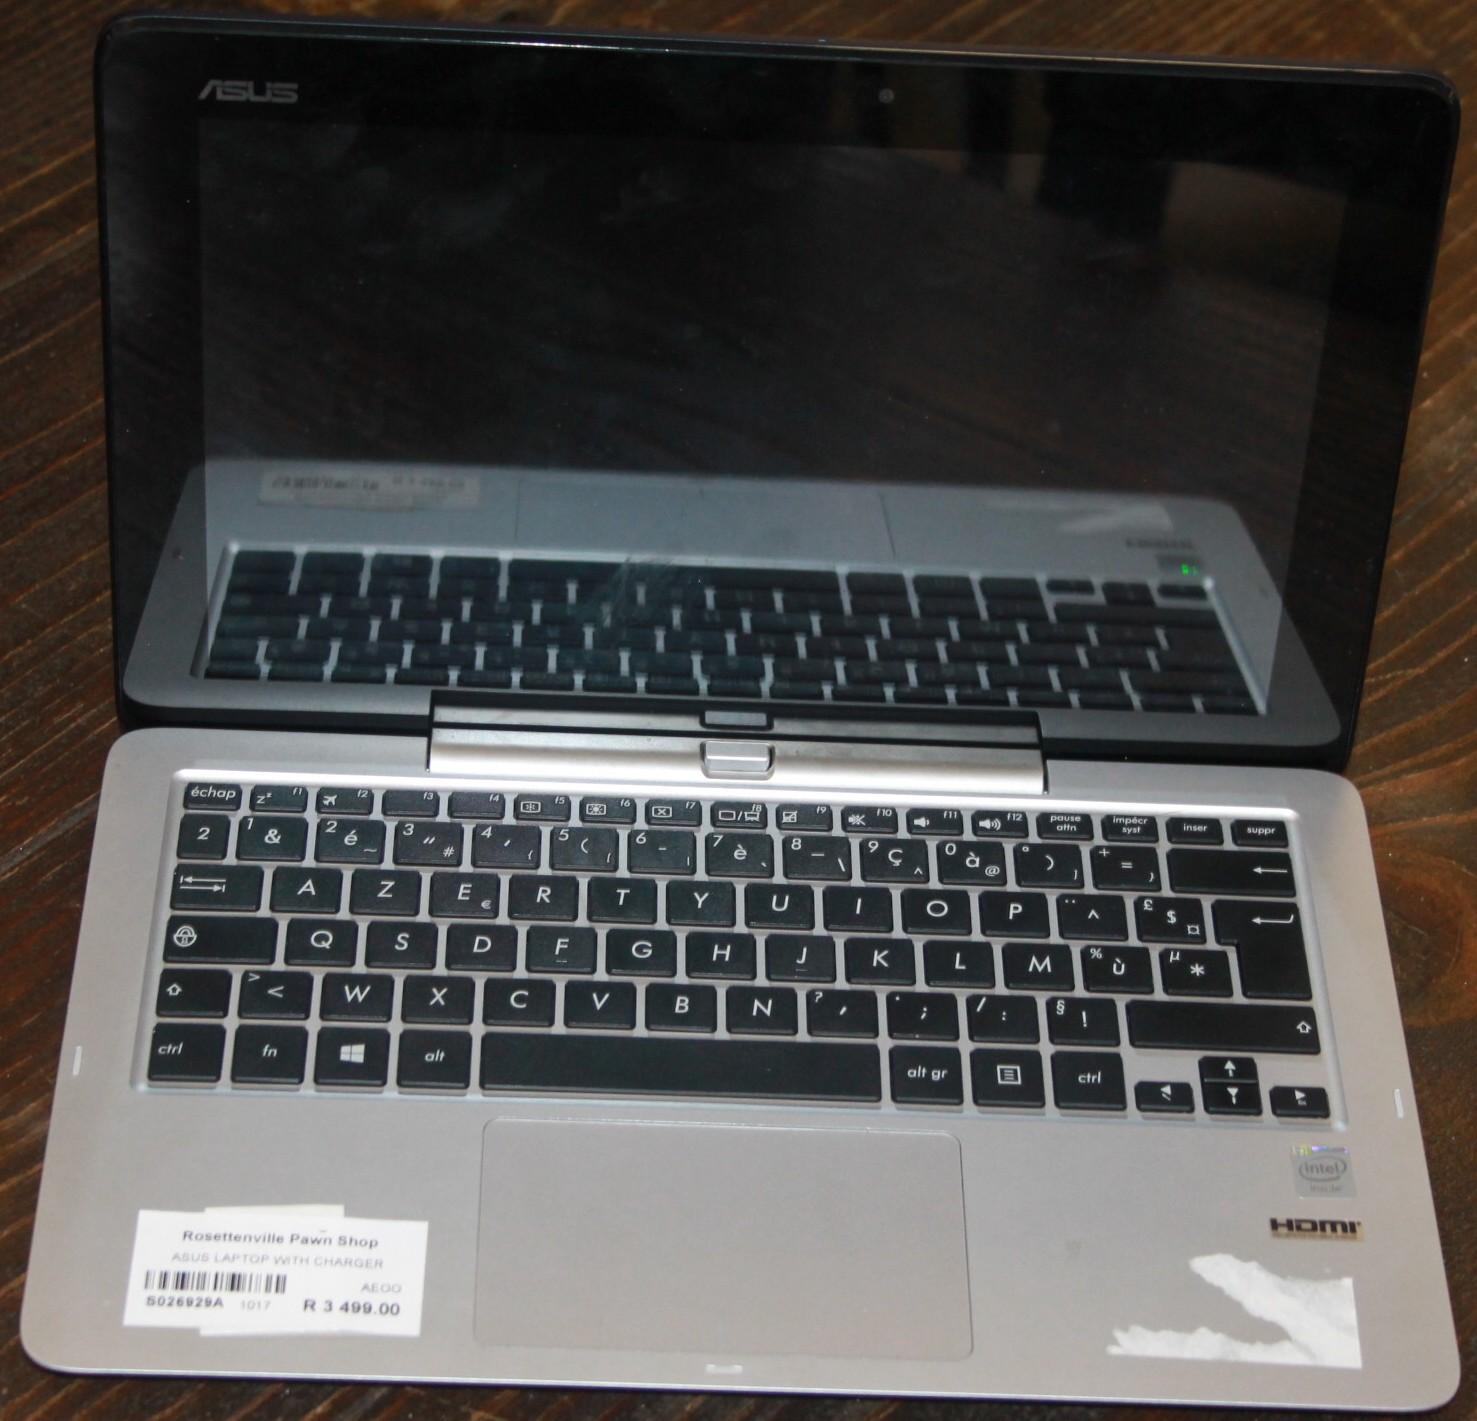 Asus laptop S026929a #Rosettenvillepawnshop